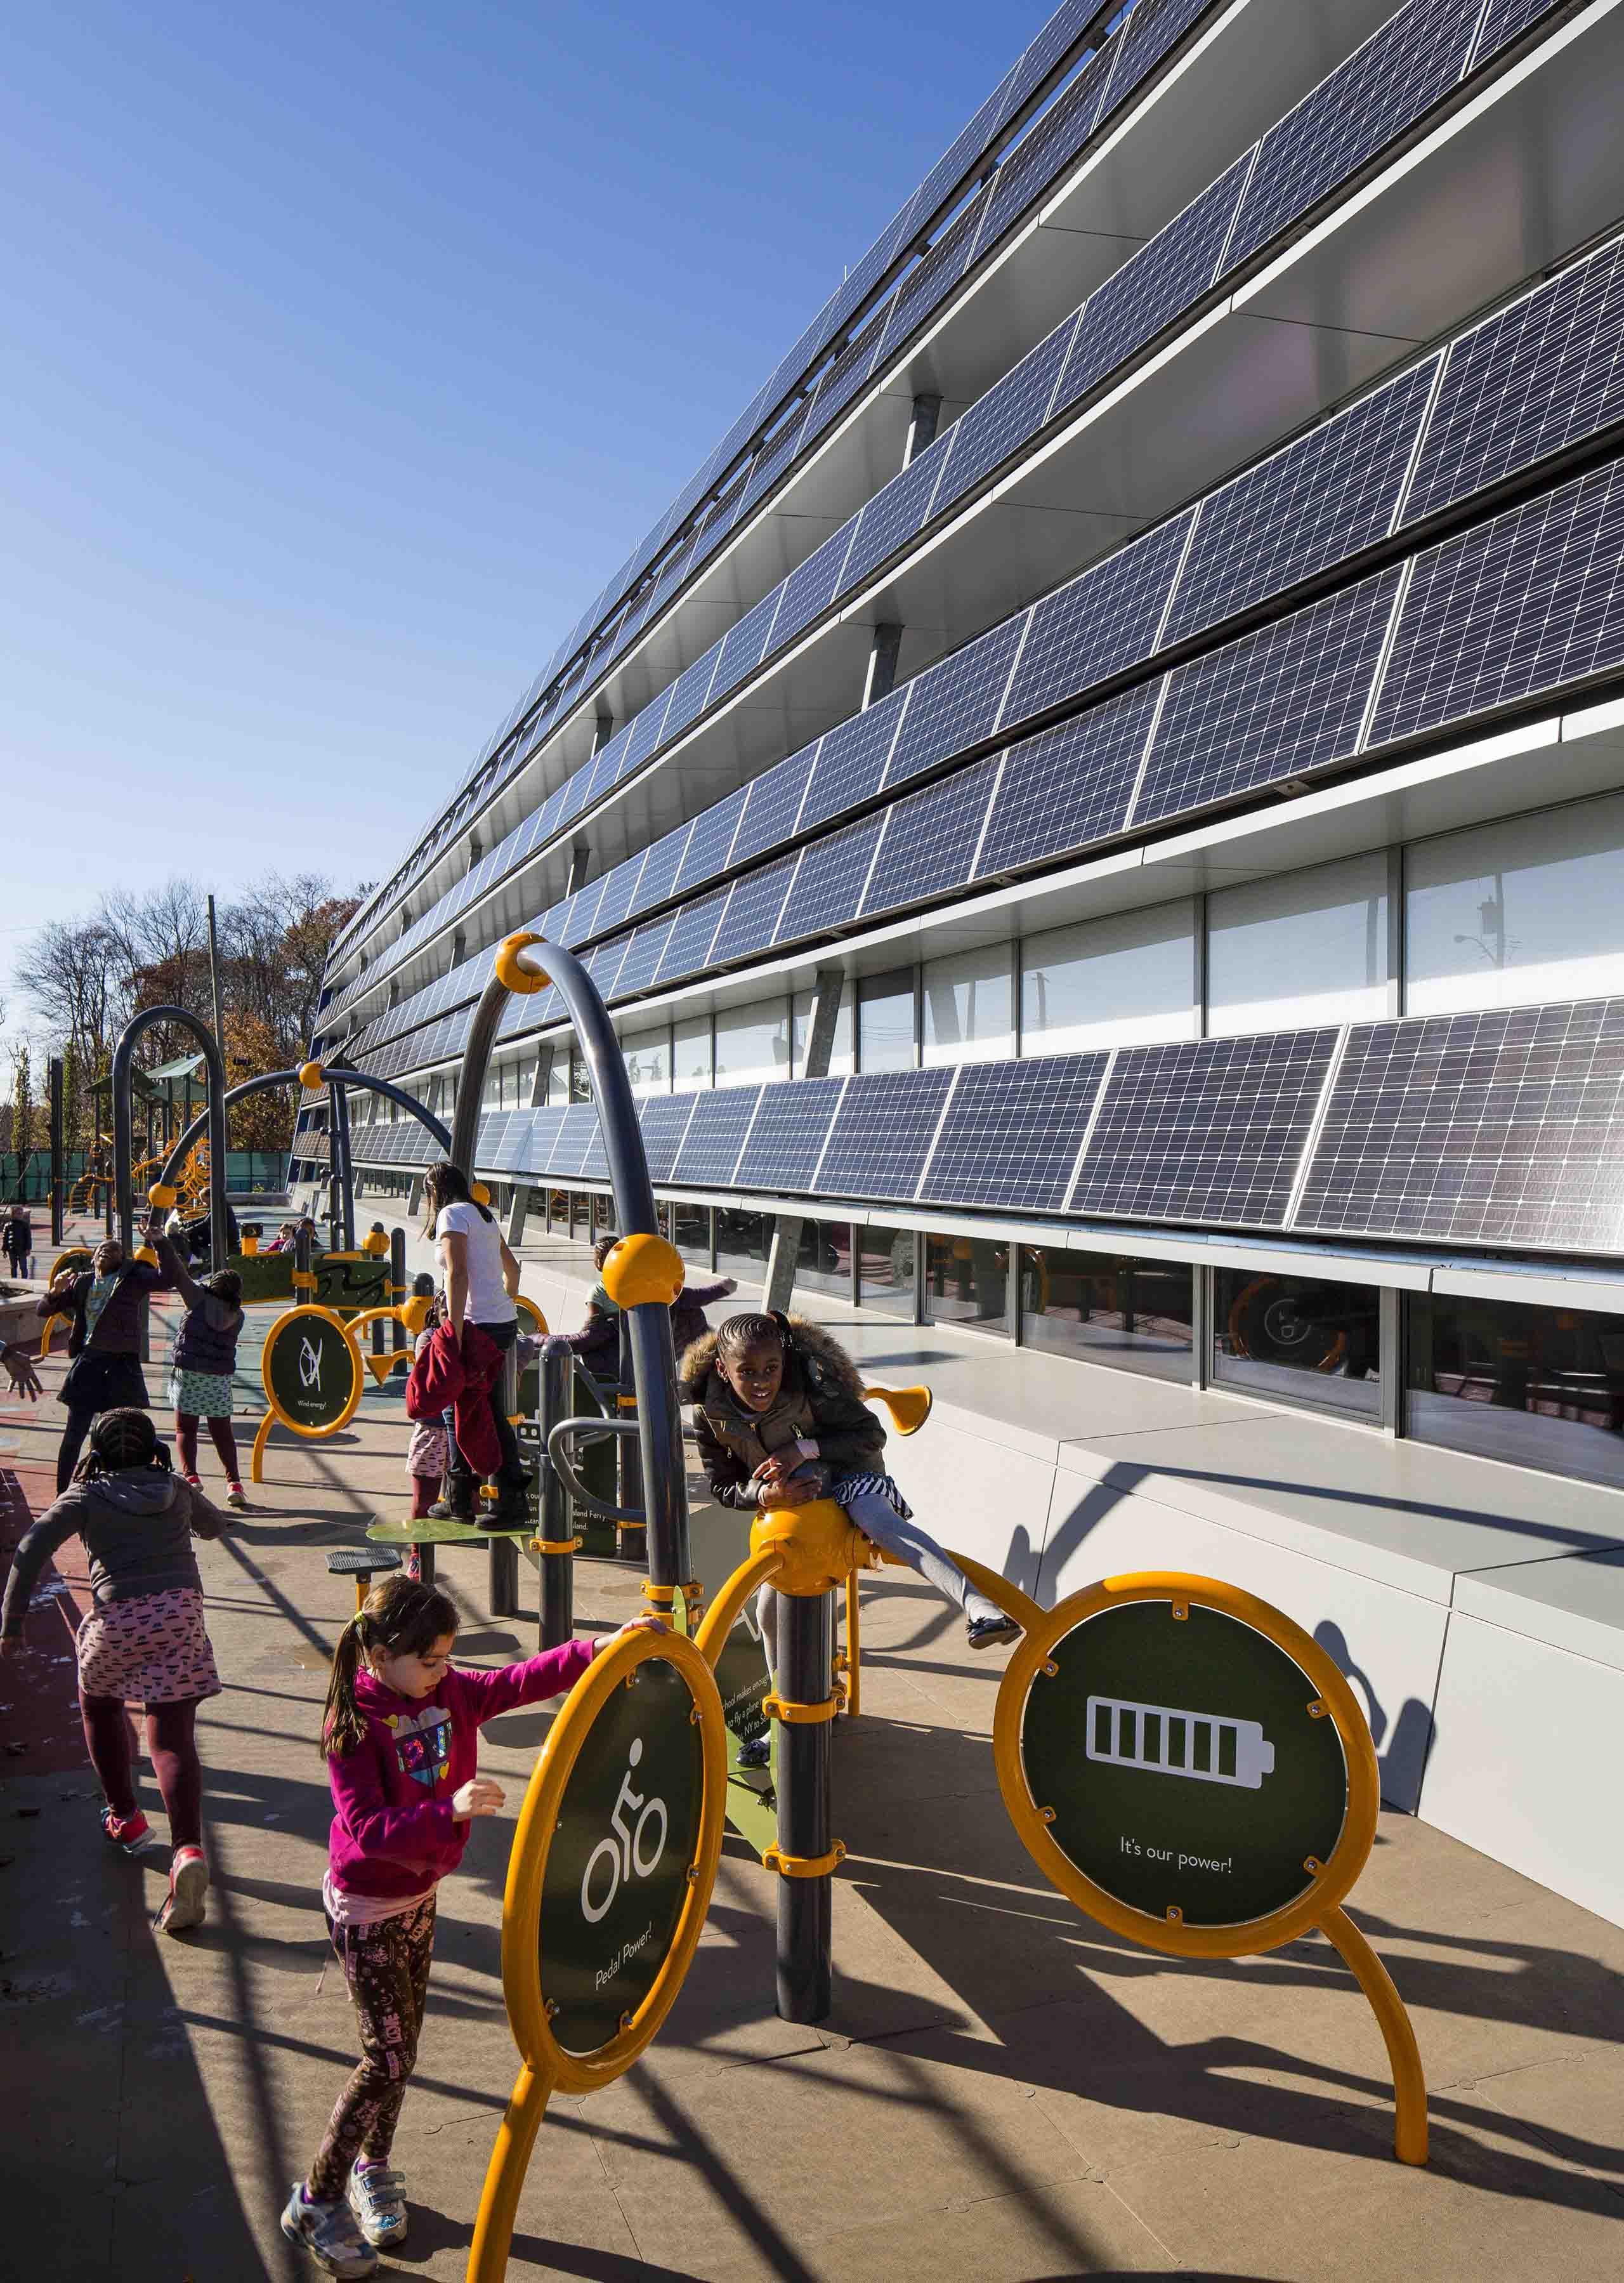 Playground and Solar Panels